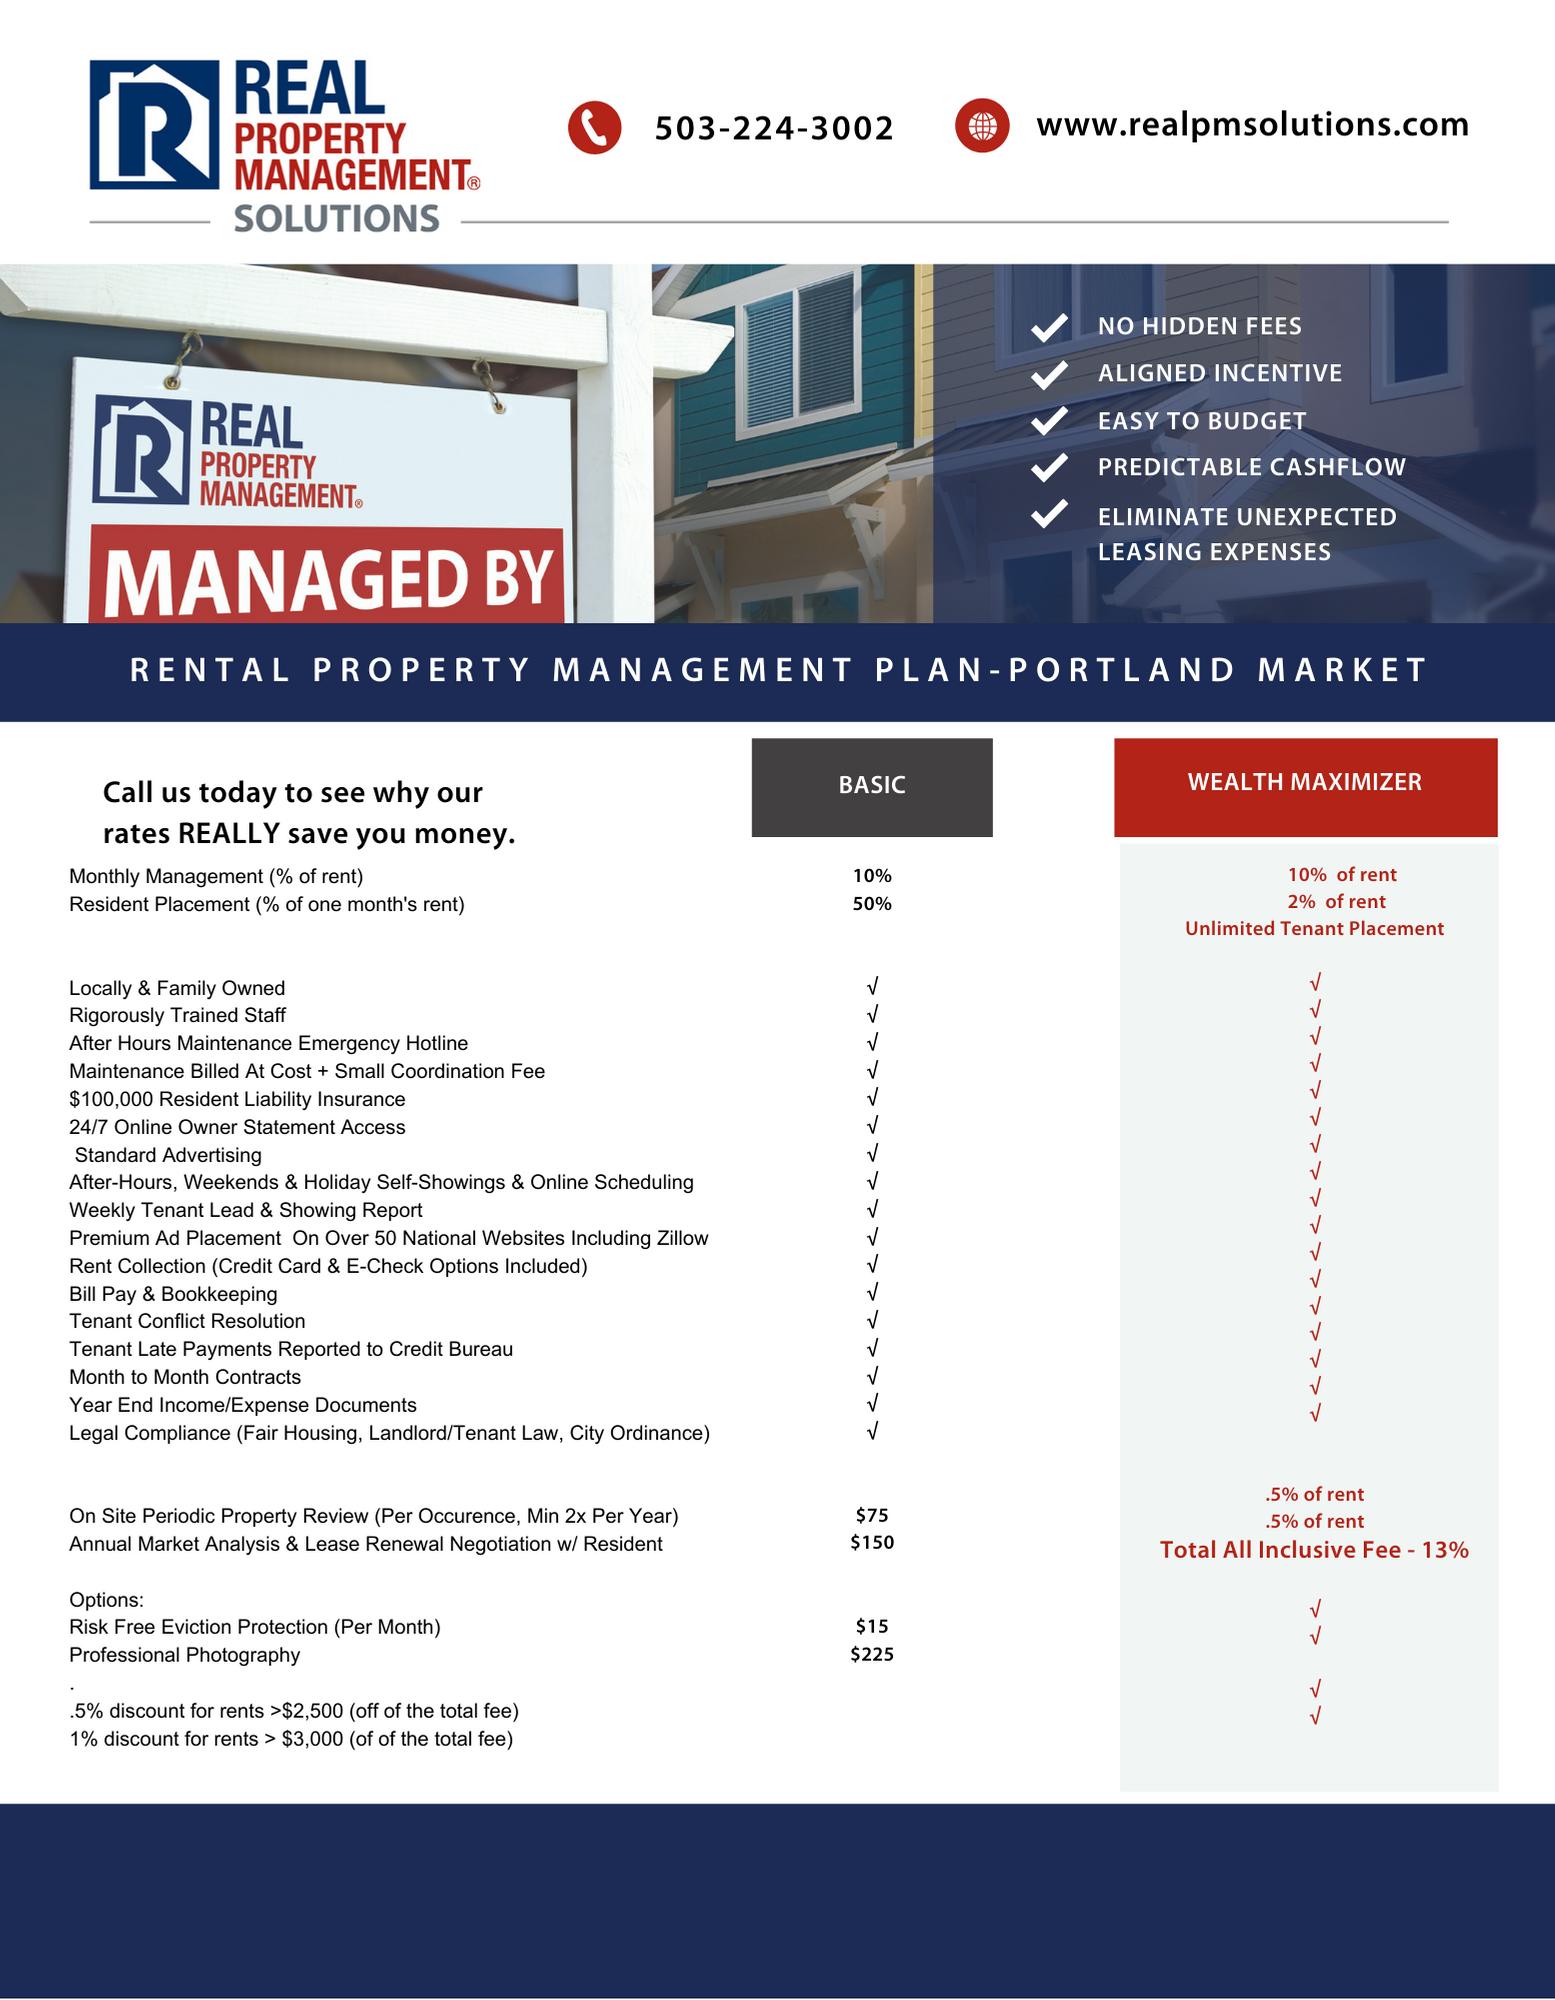 Real Property Management Solutions Portland Market 2021